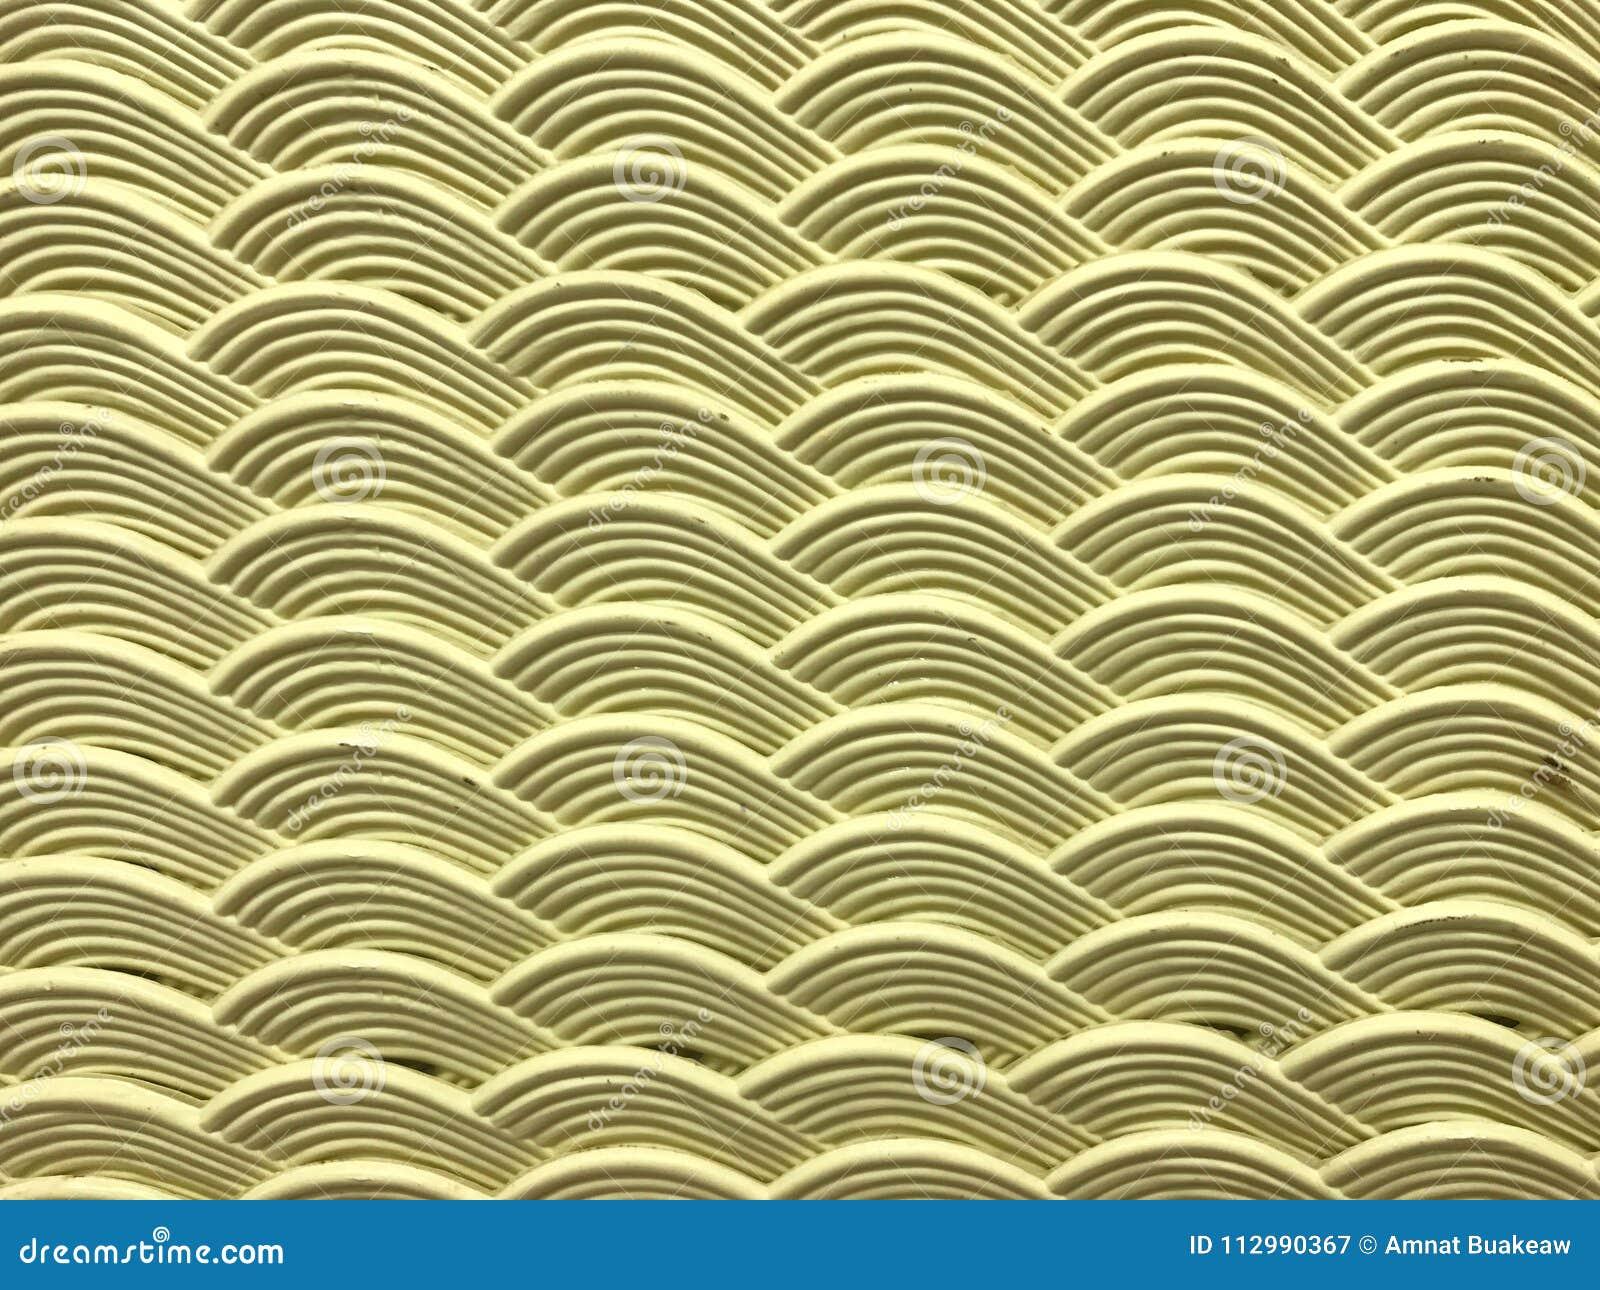 Plastic fiber pattern texture background, wallpaper pattern graphic wave, plastic detailing form industrial;